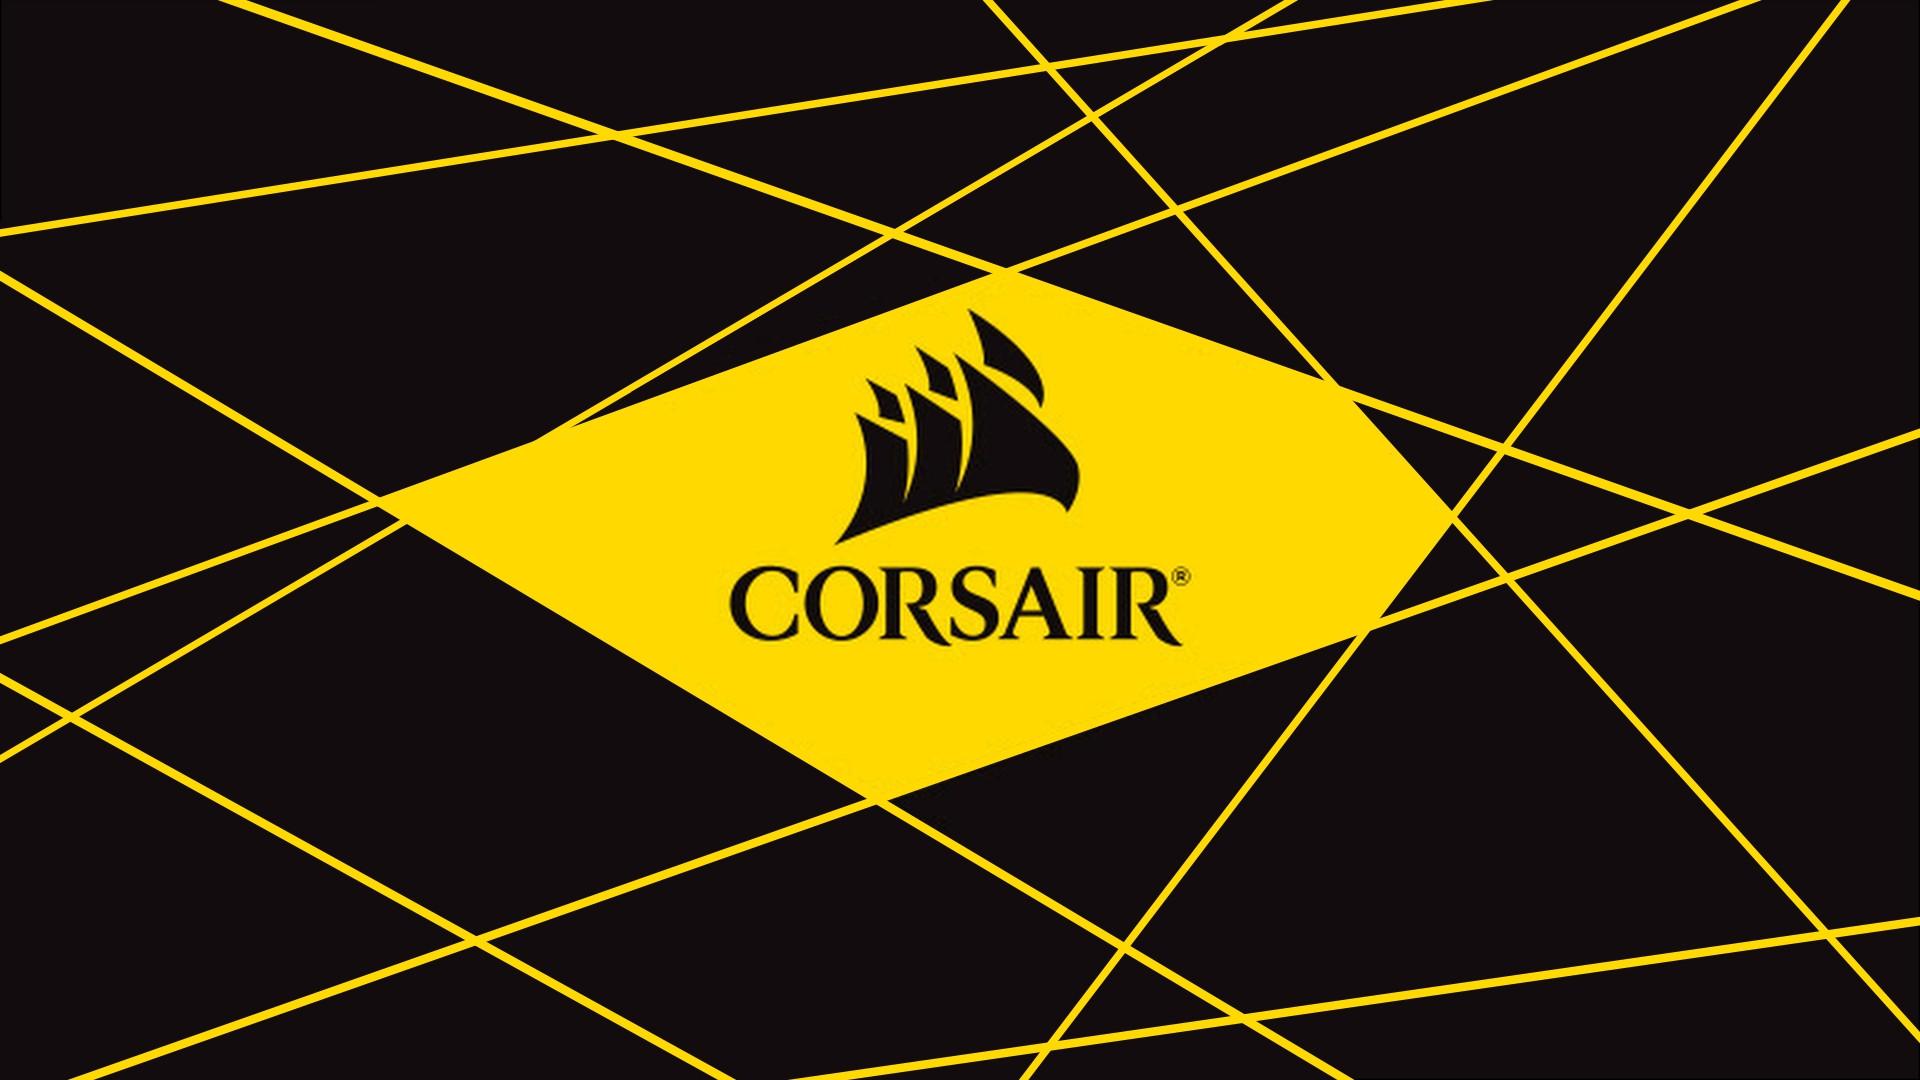 corsair 2.jpg